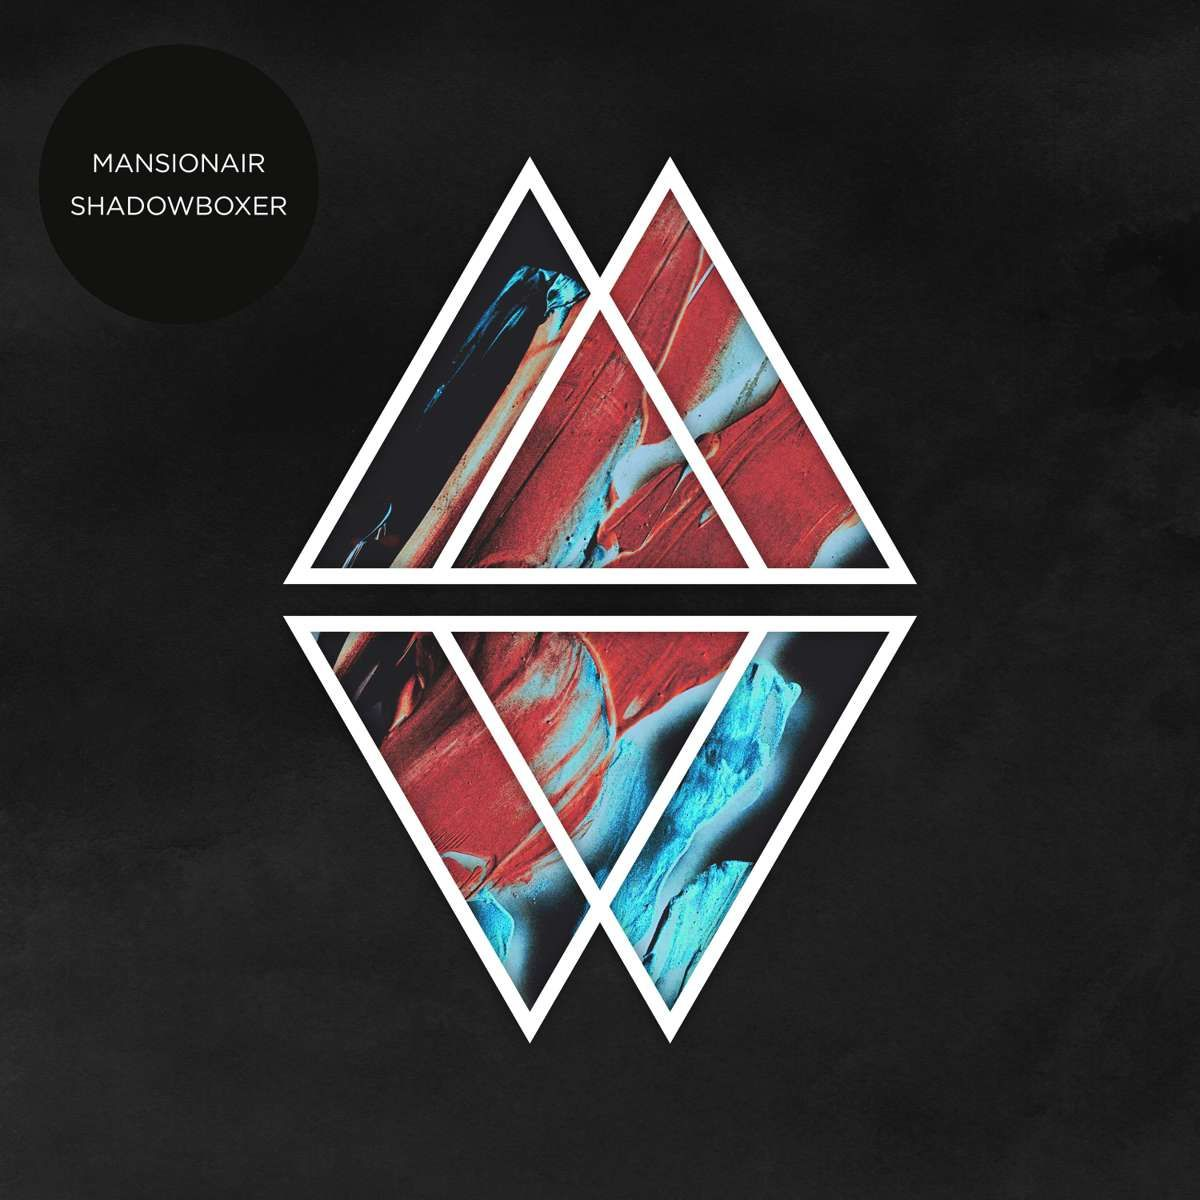 Mansionair - Shadowboxer (Vinyl) - Liberation Records